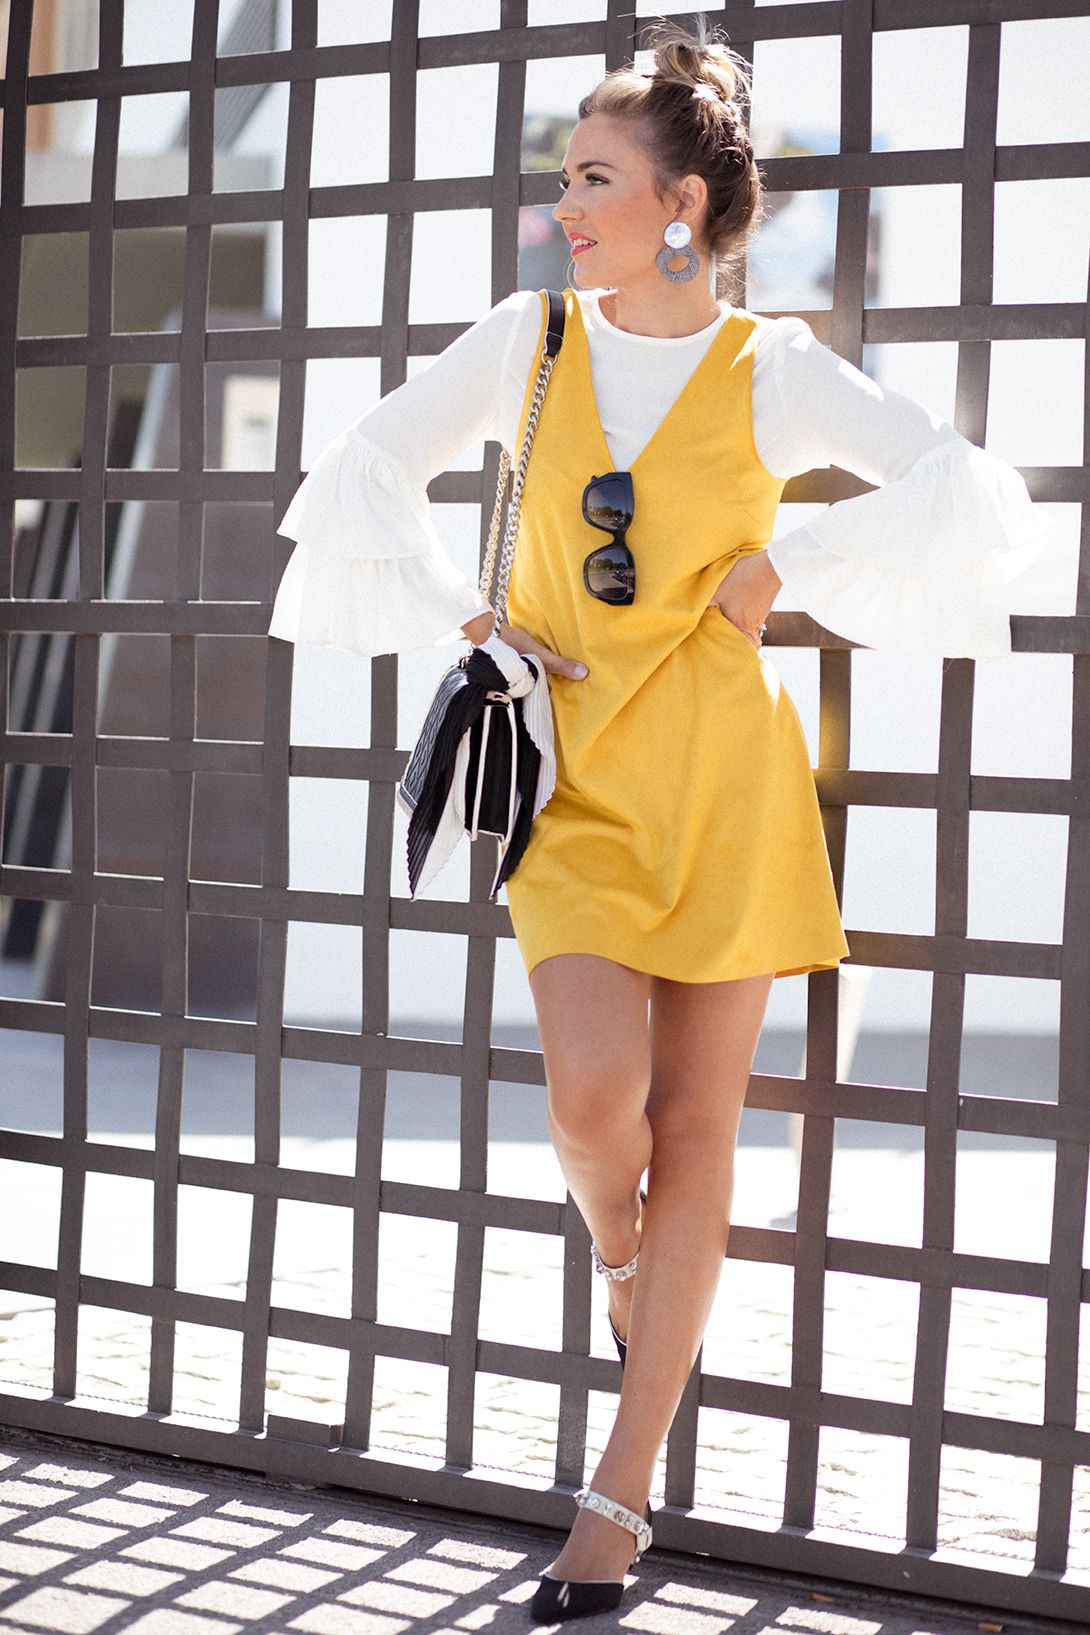 92467864befc0 White ruffle blouse+mustard dress+black pearl pumps+black chain shoulder  bag+